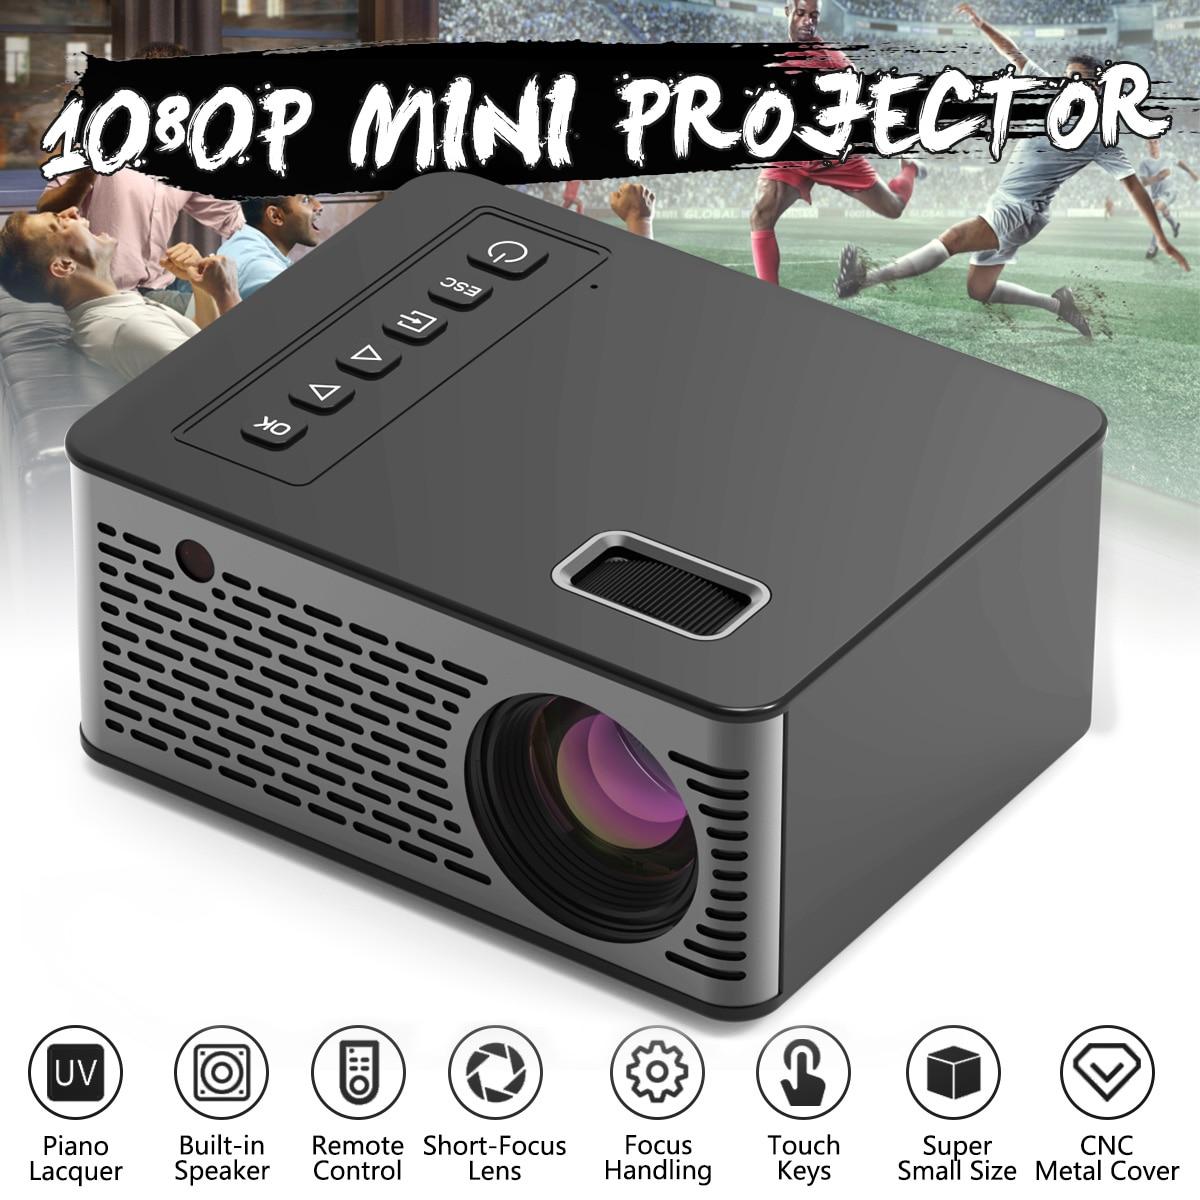 110-240V 1080P HD LED Light Source Design Portable Home Cinema Projector Adjustable Built-in Lens Beamer AV//HDMI//USB//TF Green US Mini Projector